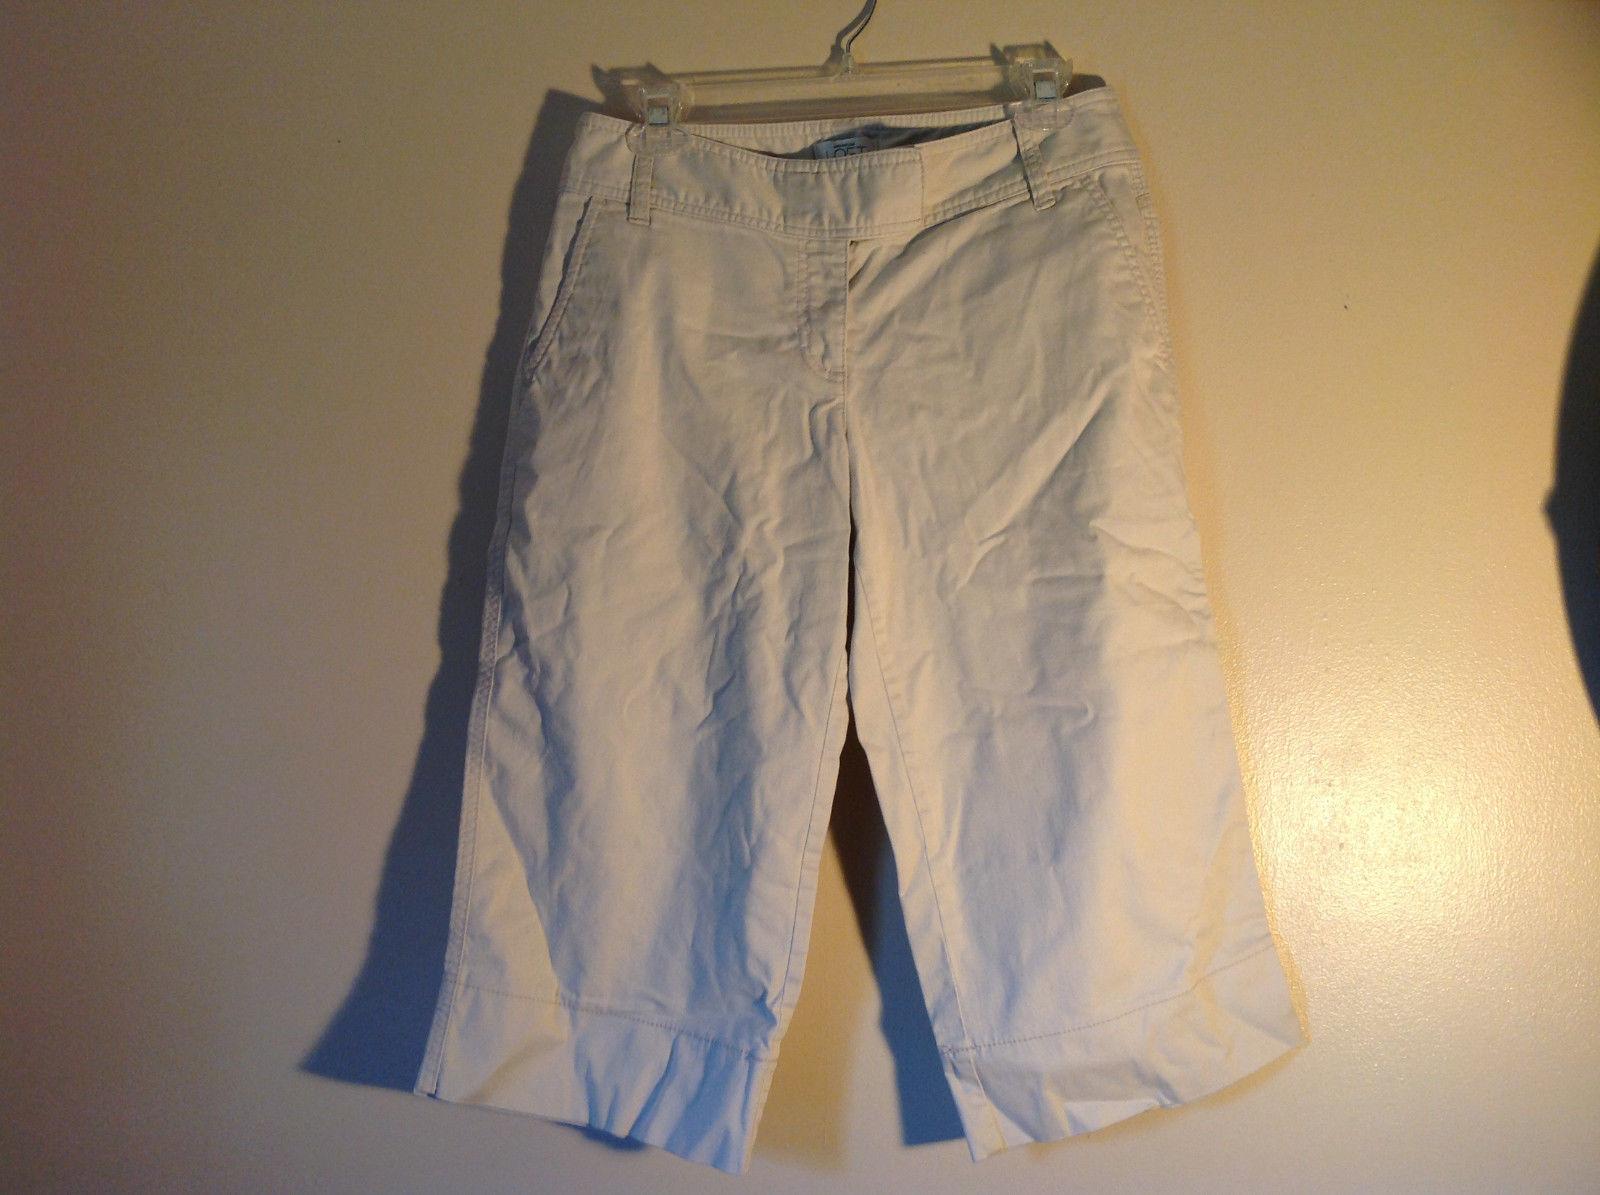 Light Khaki 4 Pocket Capri Pants Zipper Button Clasp Closure Ann Taylor Size 4